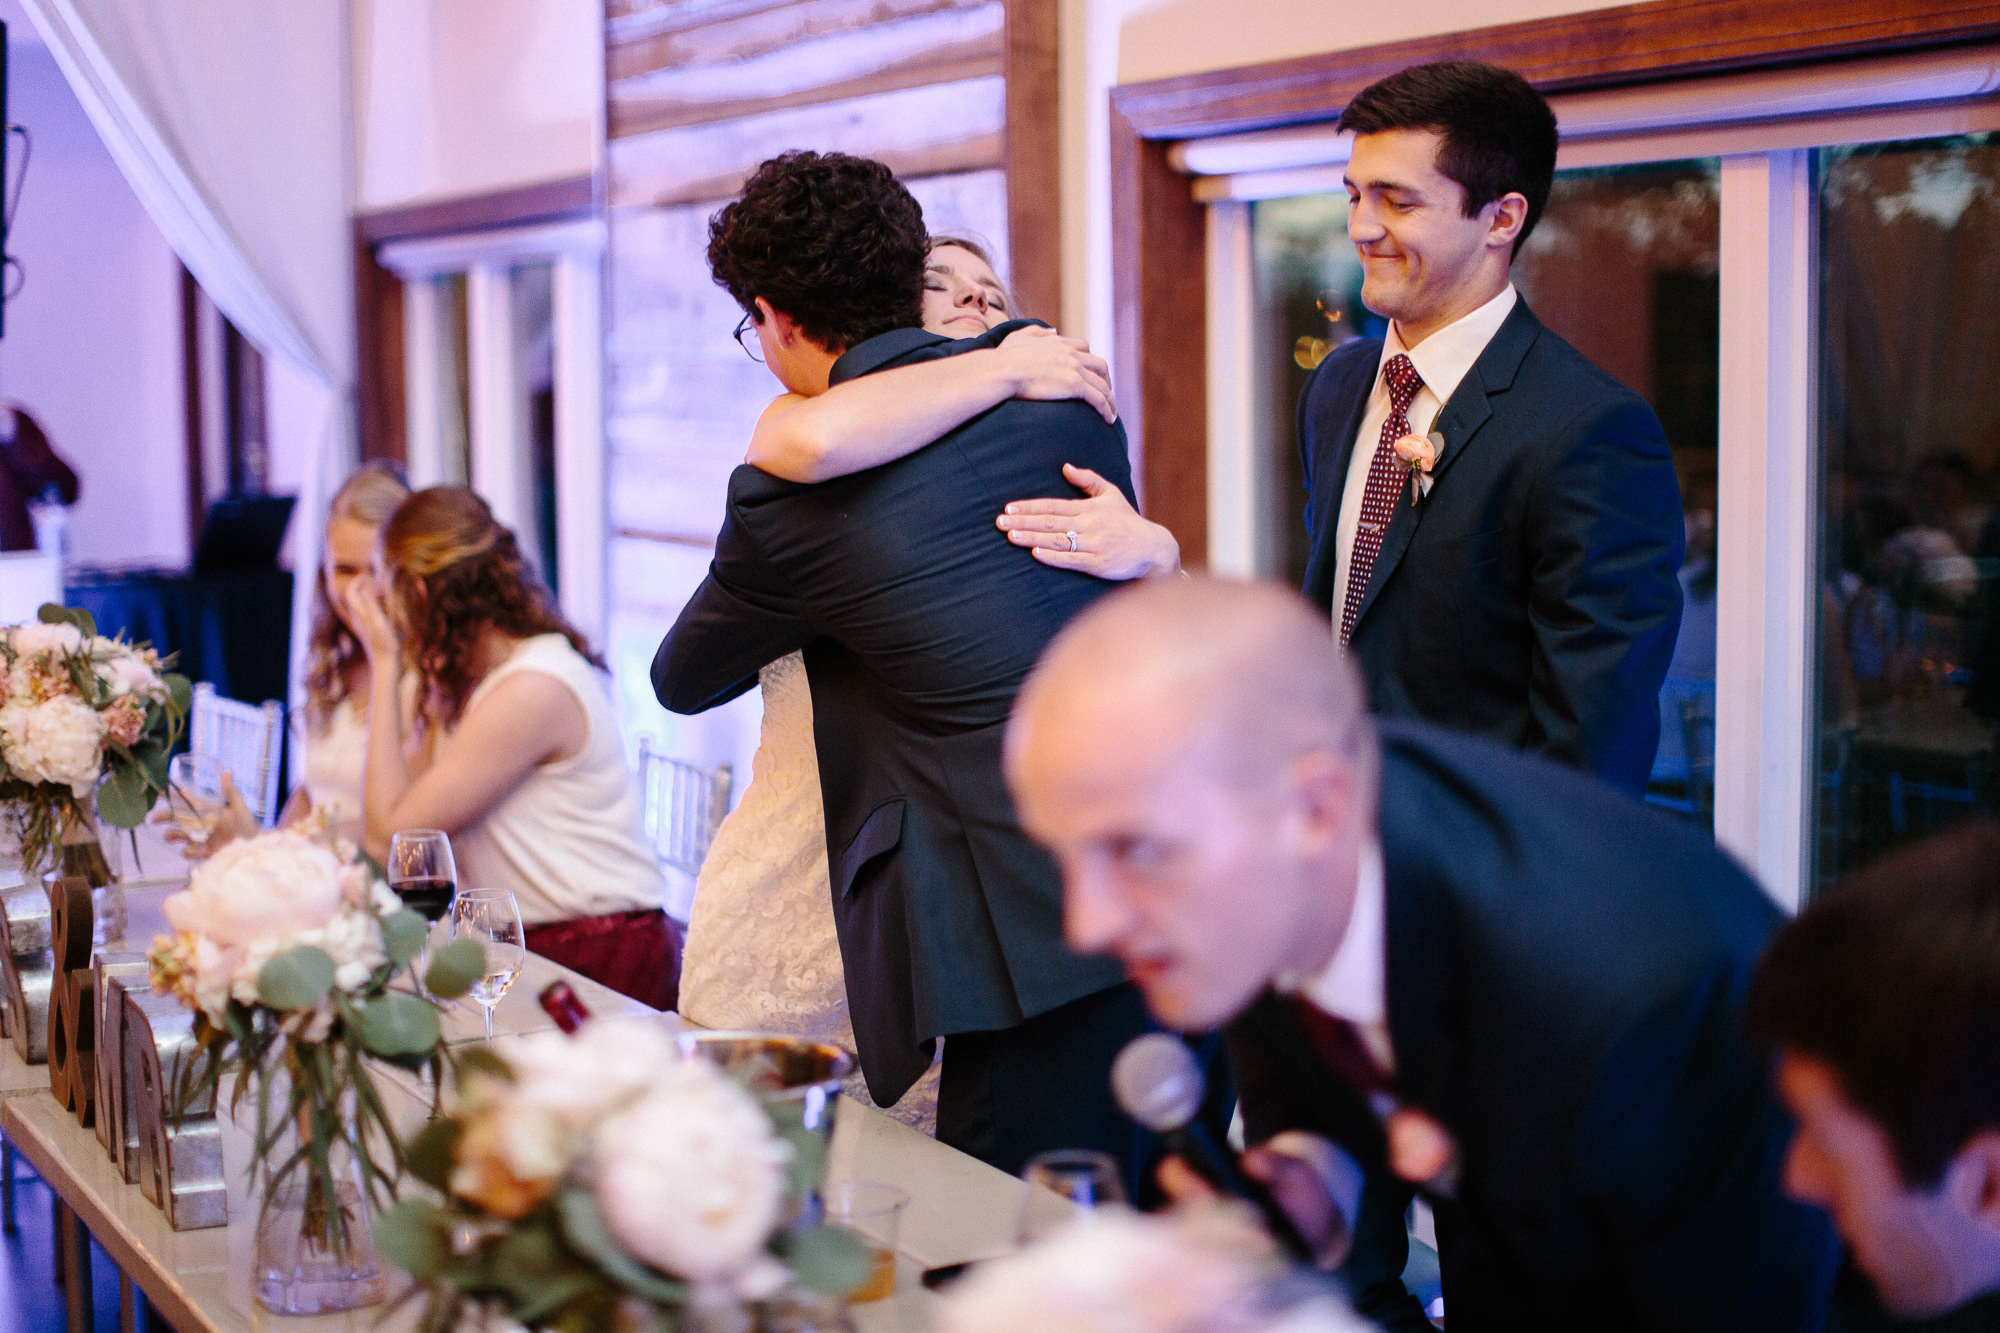 wedding-elopement-adventerous-romantic-timeless-south-dakota-blue-haven-barn-105.jpg